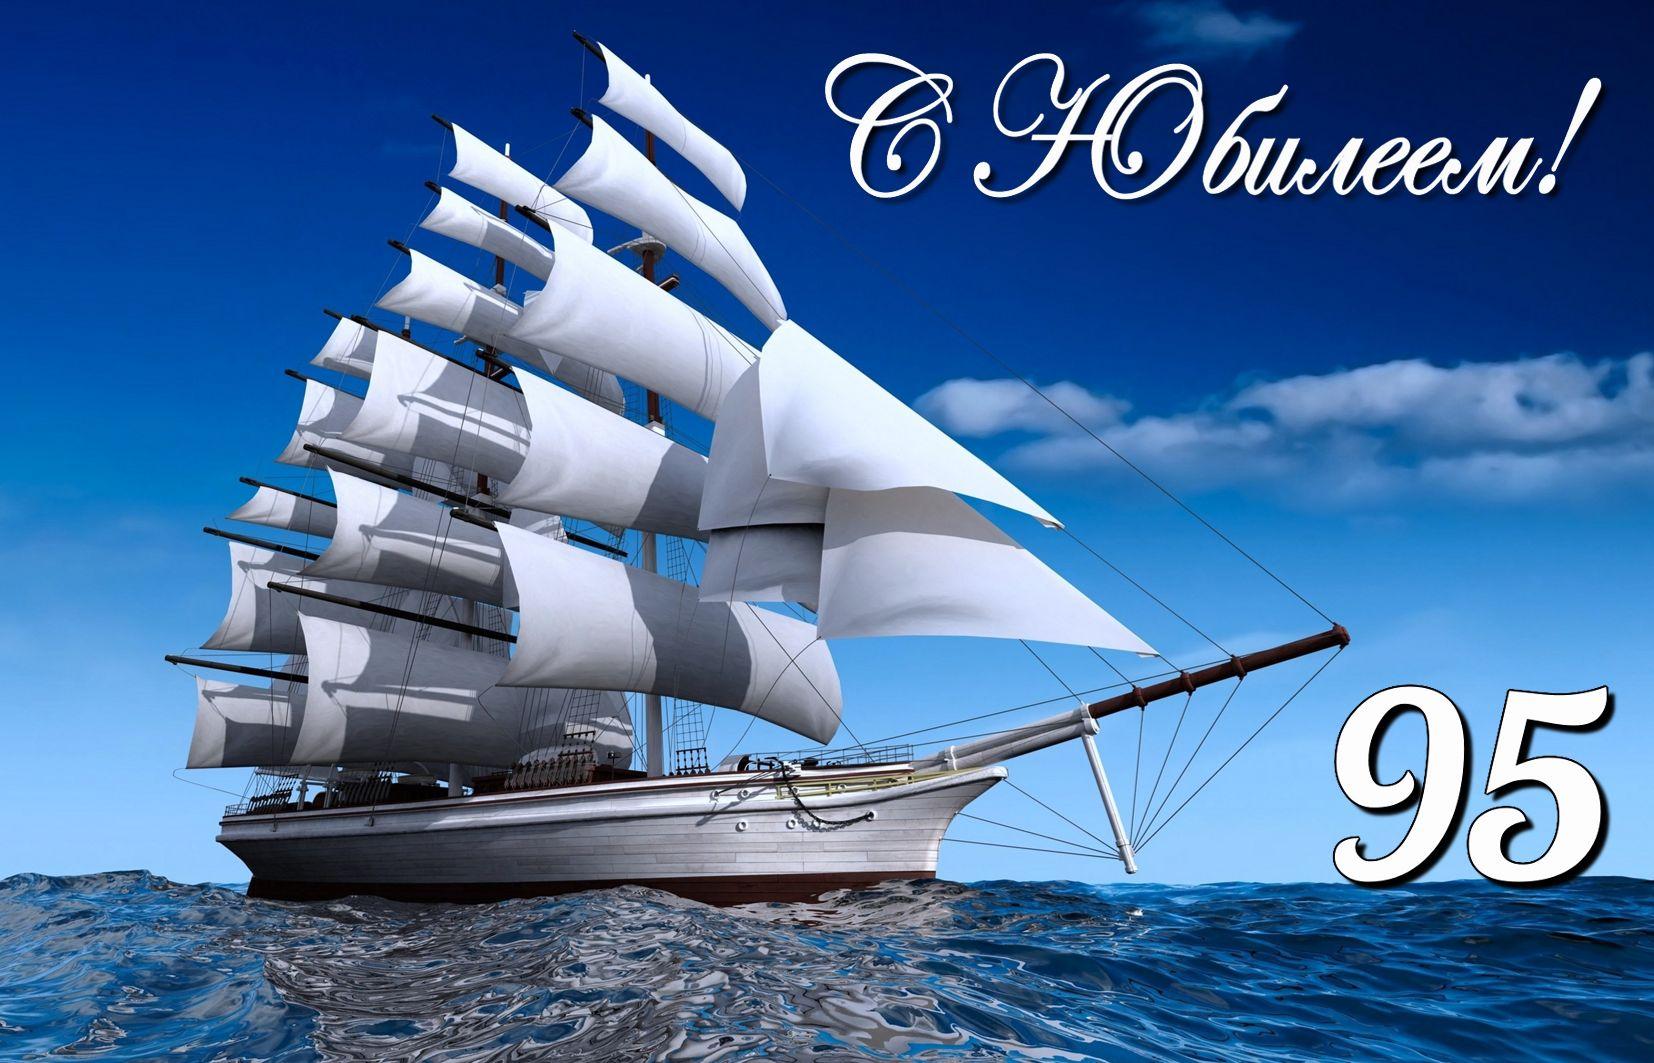 Открытка на юбилей 95 лет - парусник на волнах в бескрайнем море